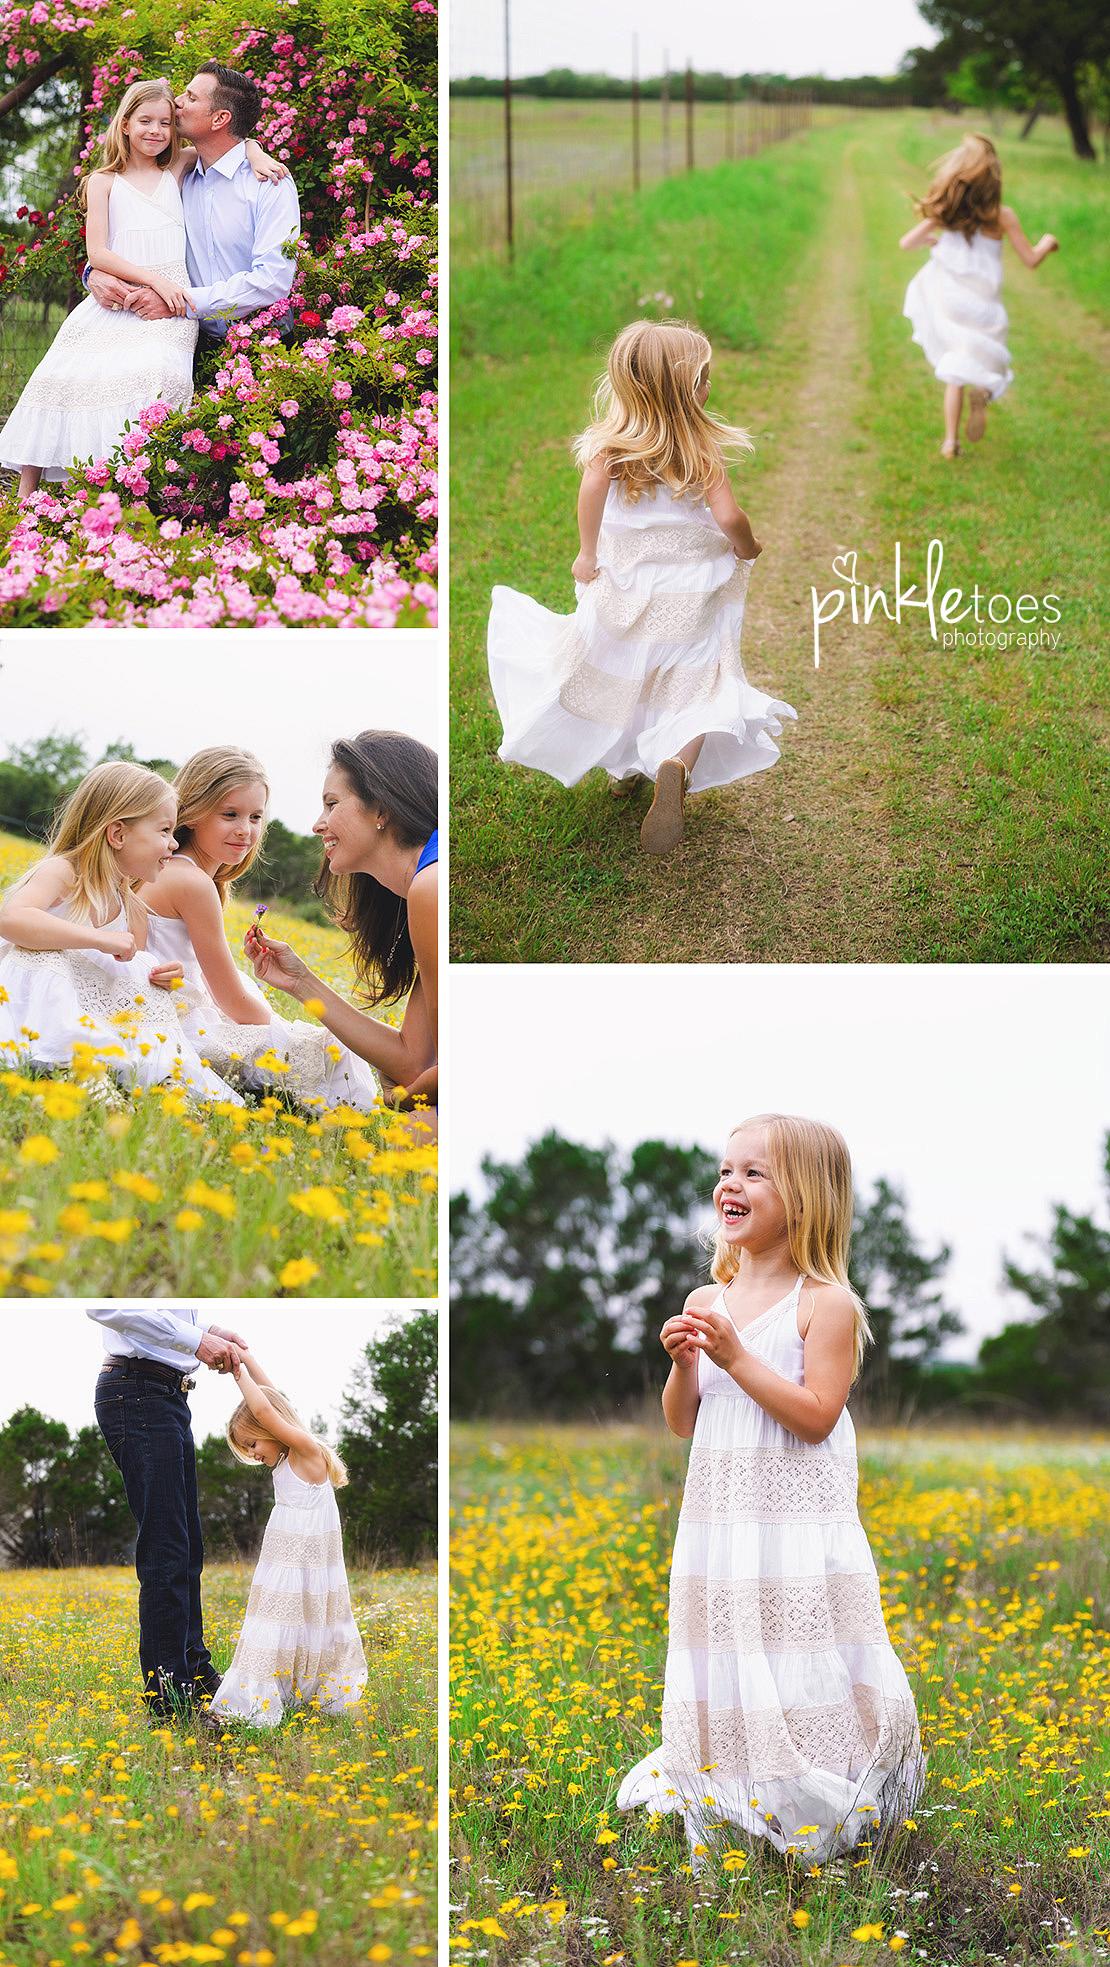 austin-family-classic-portraiture-girls-white-dresses-texas-wildflowers-stream-08